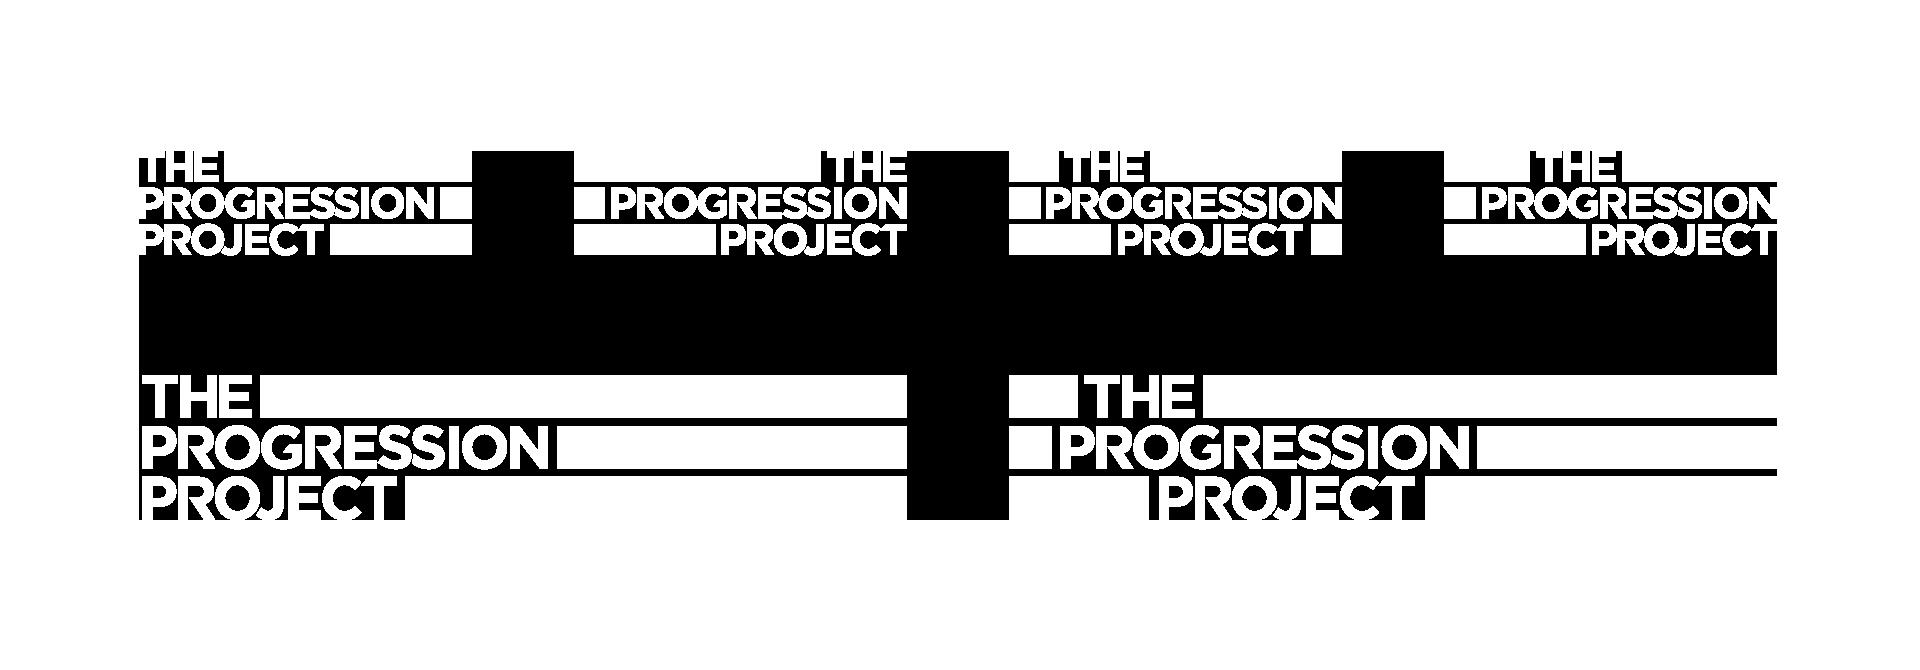 tpp_logo_variations2.png